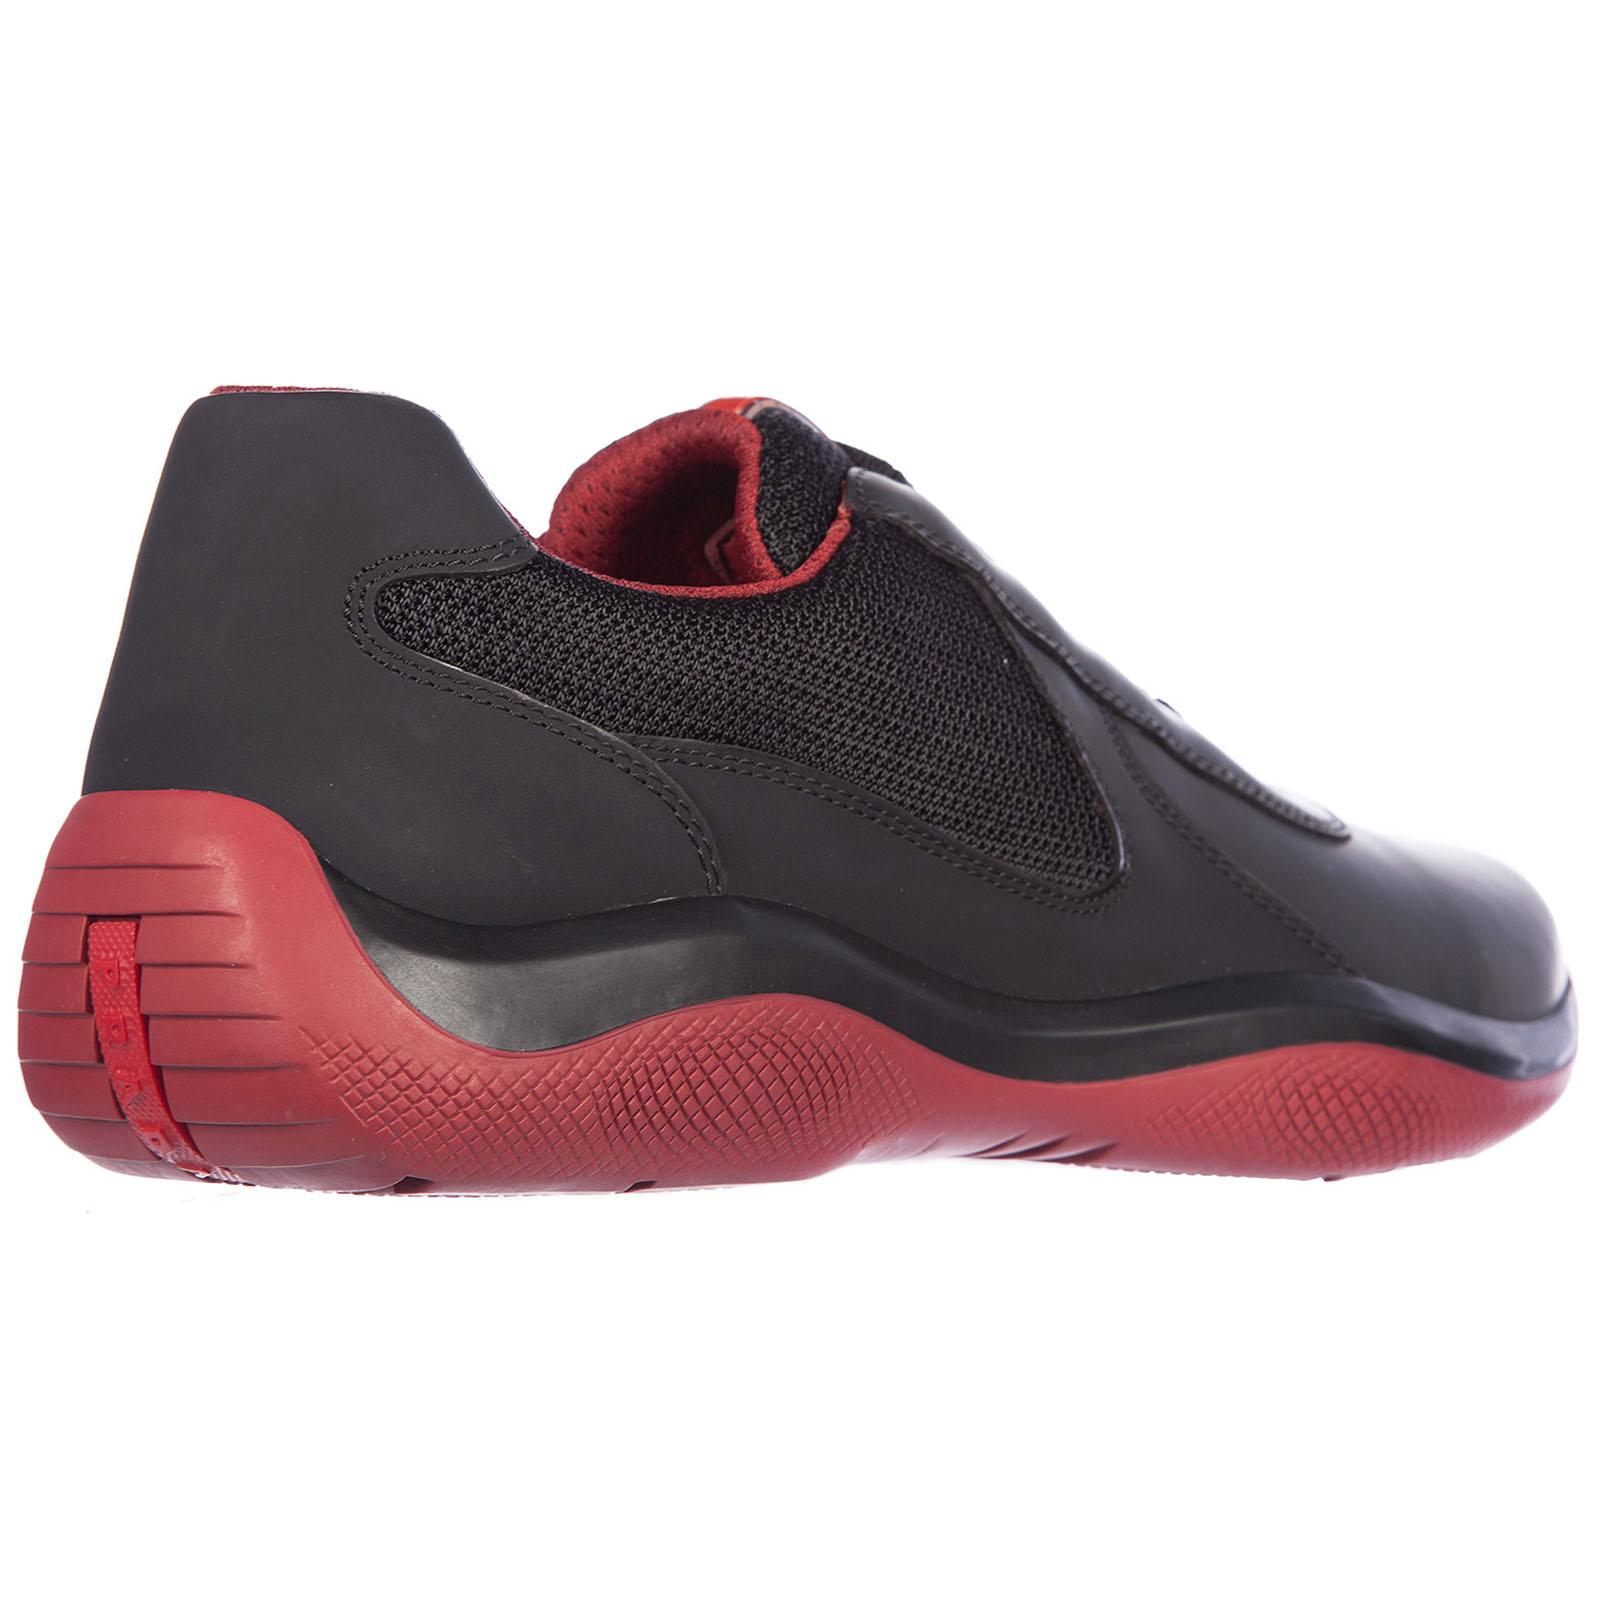 Chaussures baskets sneakers homme en cuir vitello rubber bike